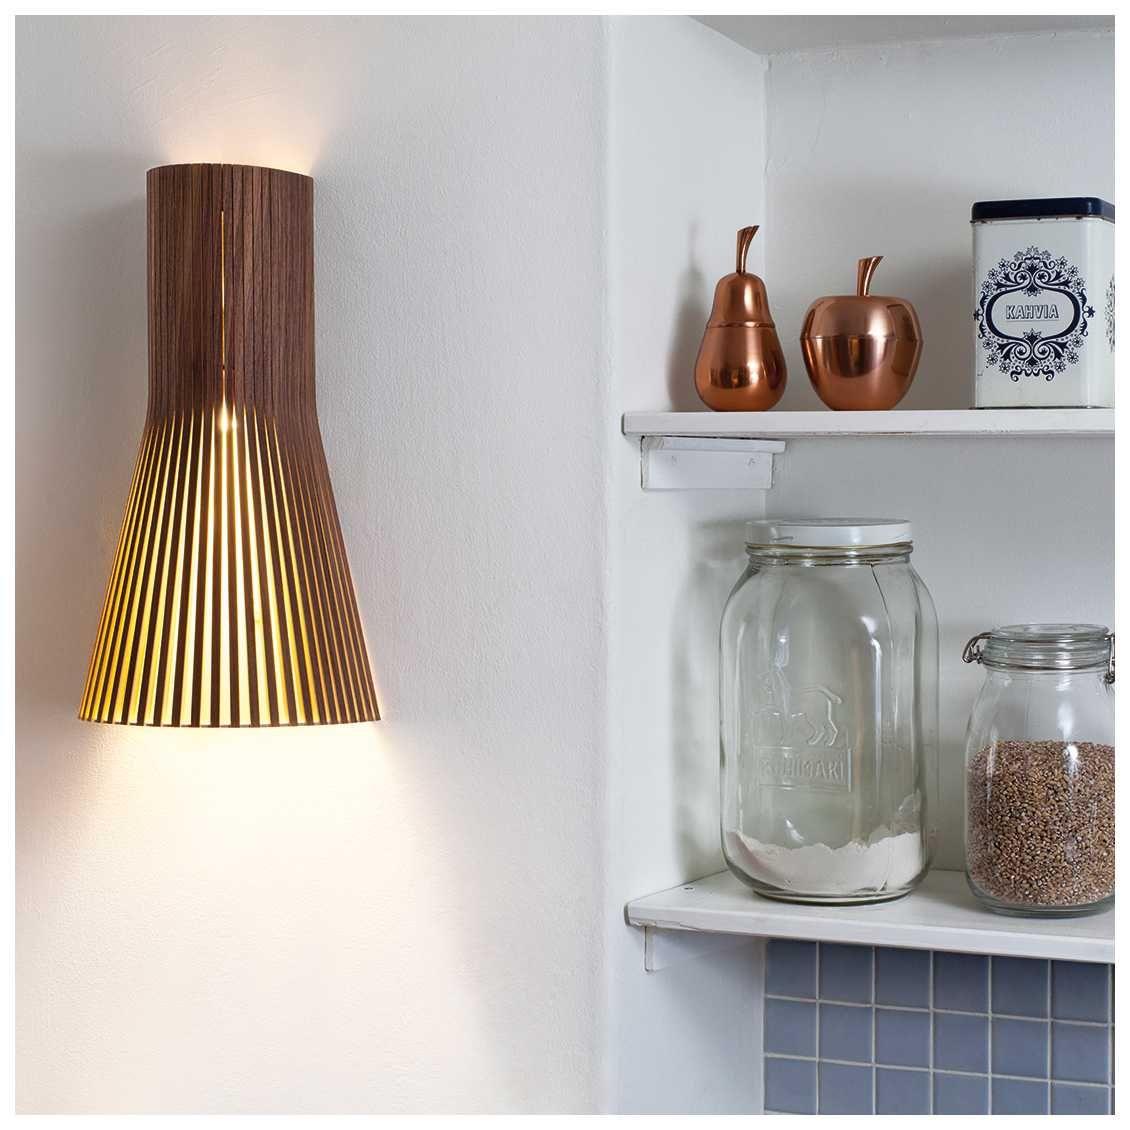 Secto 4231 Wandlamp Misterdesign Wandlamp Lampen Muur Ideeen